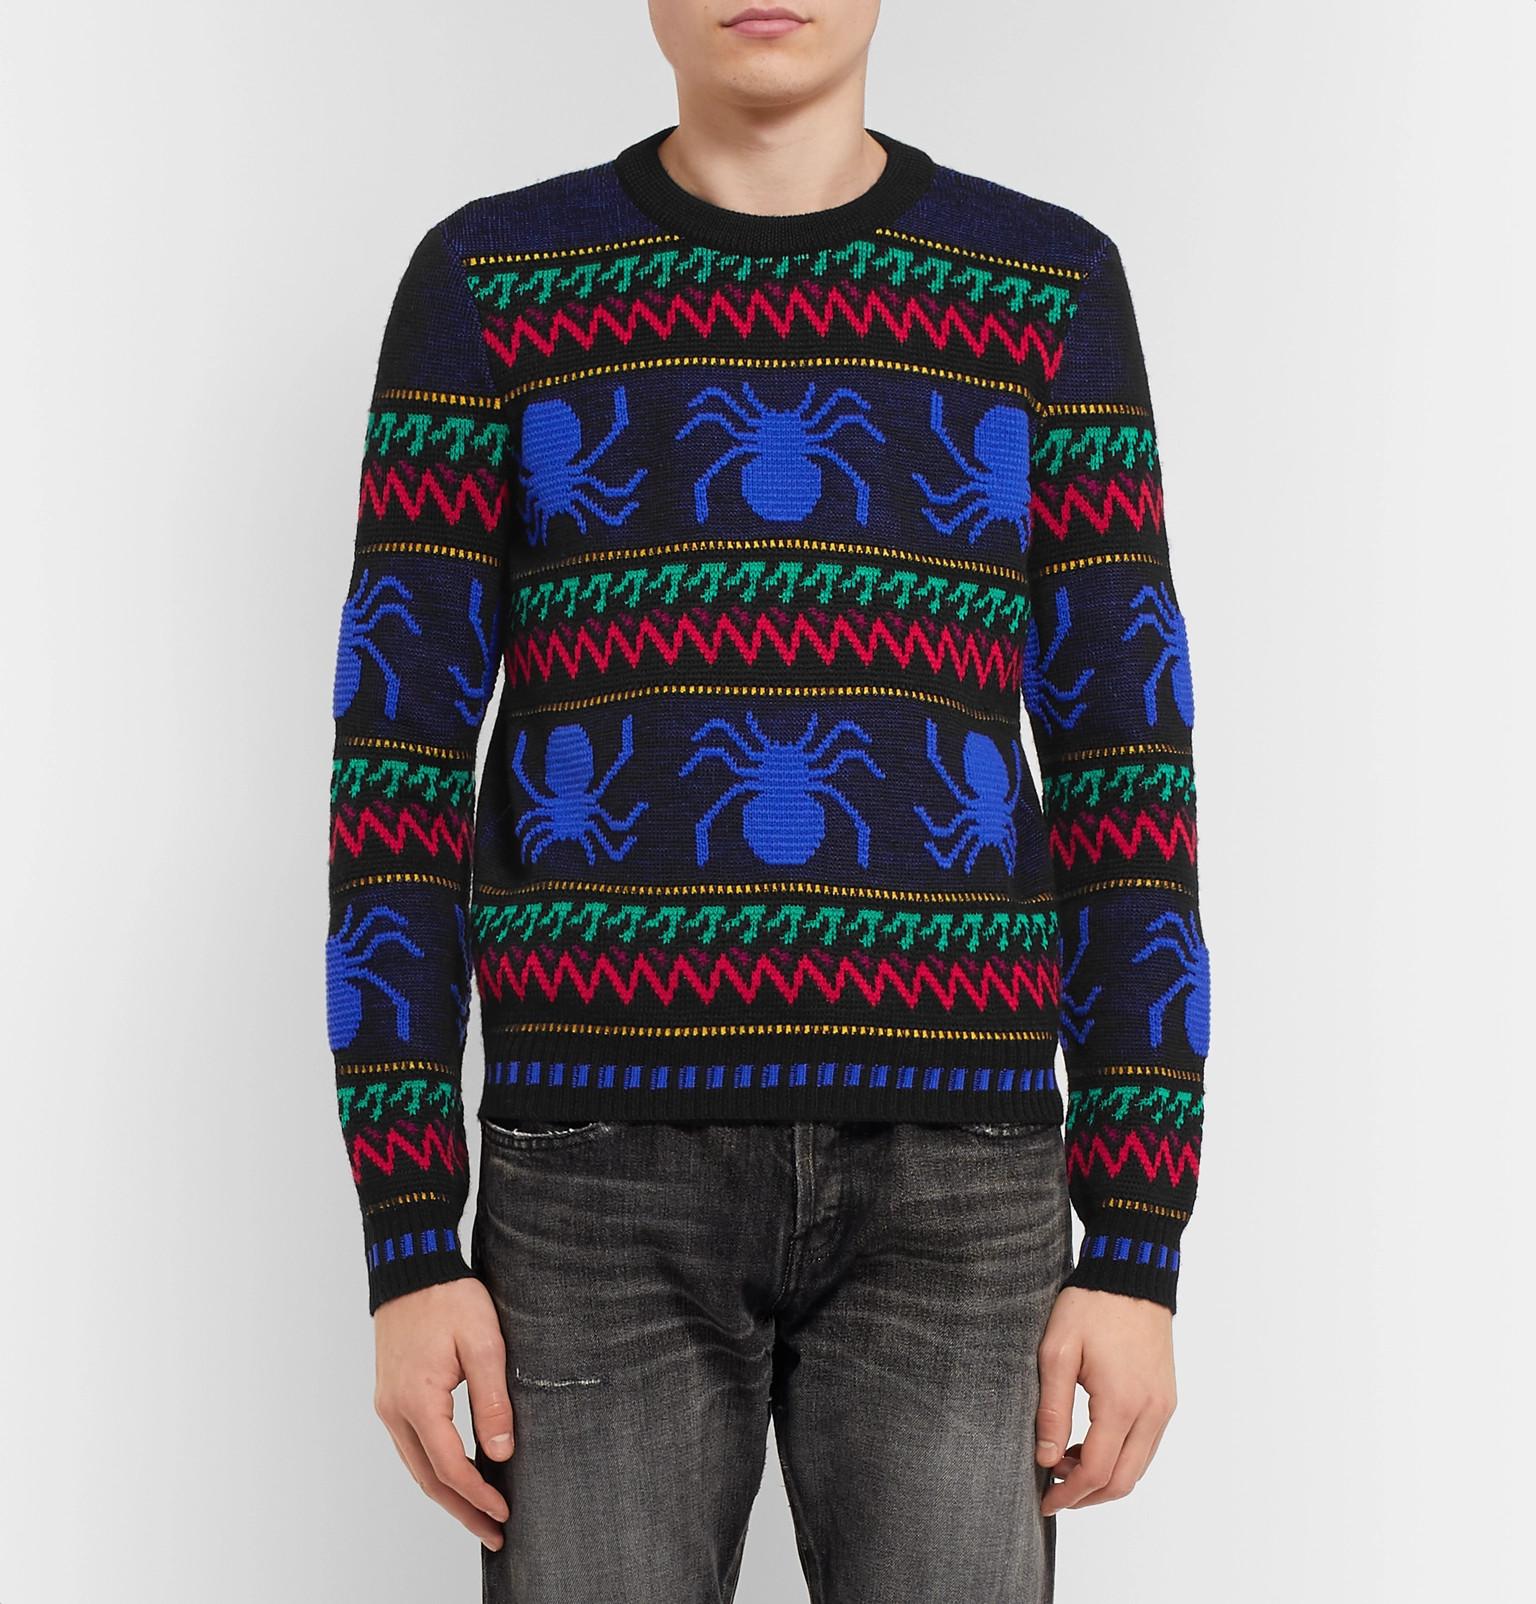 Intarsia Spider Saint Fit Sweater Laurentslim Wool wTPvCx0q